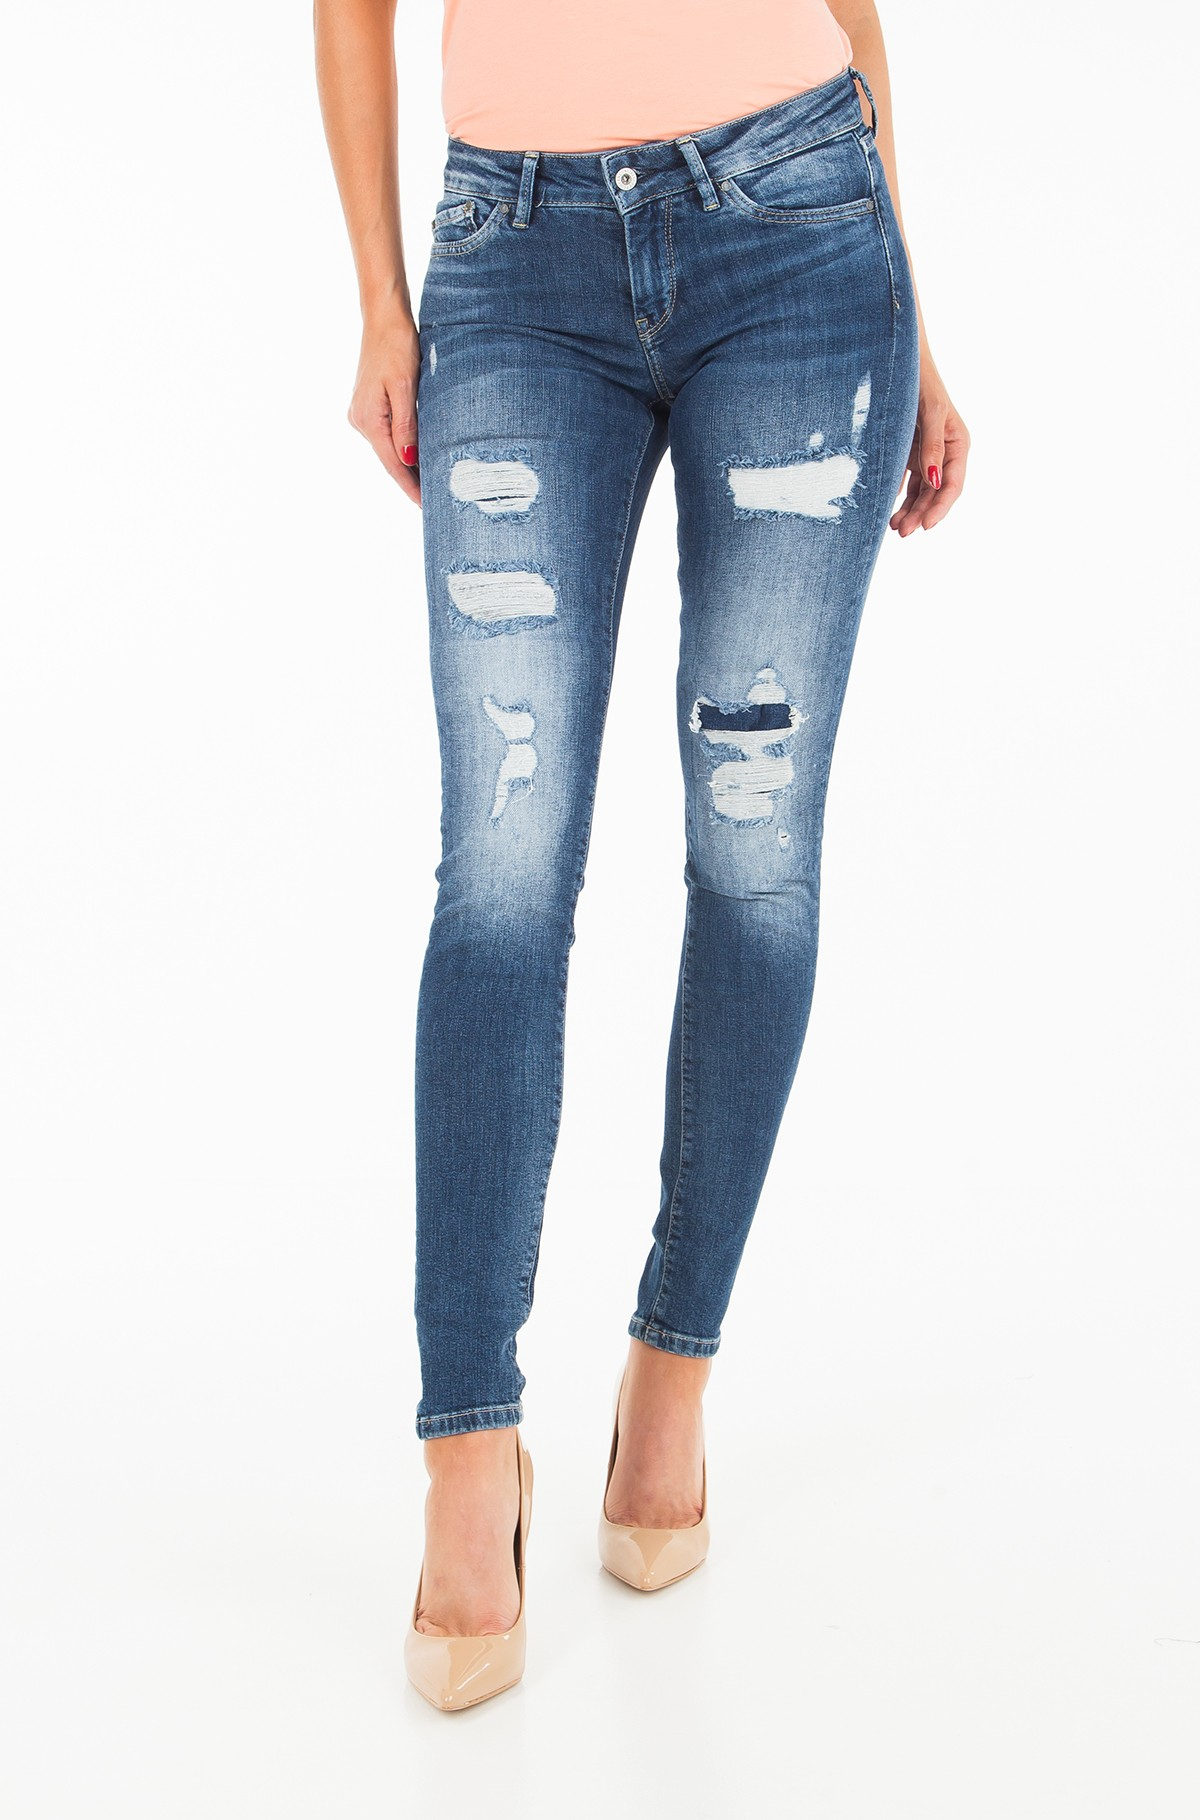 Jeans PIXIE/PL200025RC9-full-1